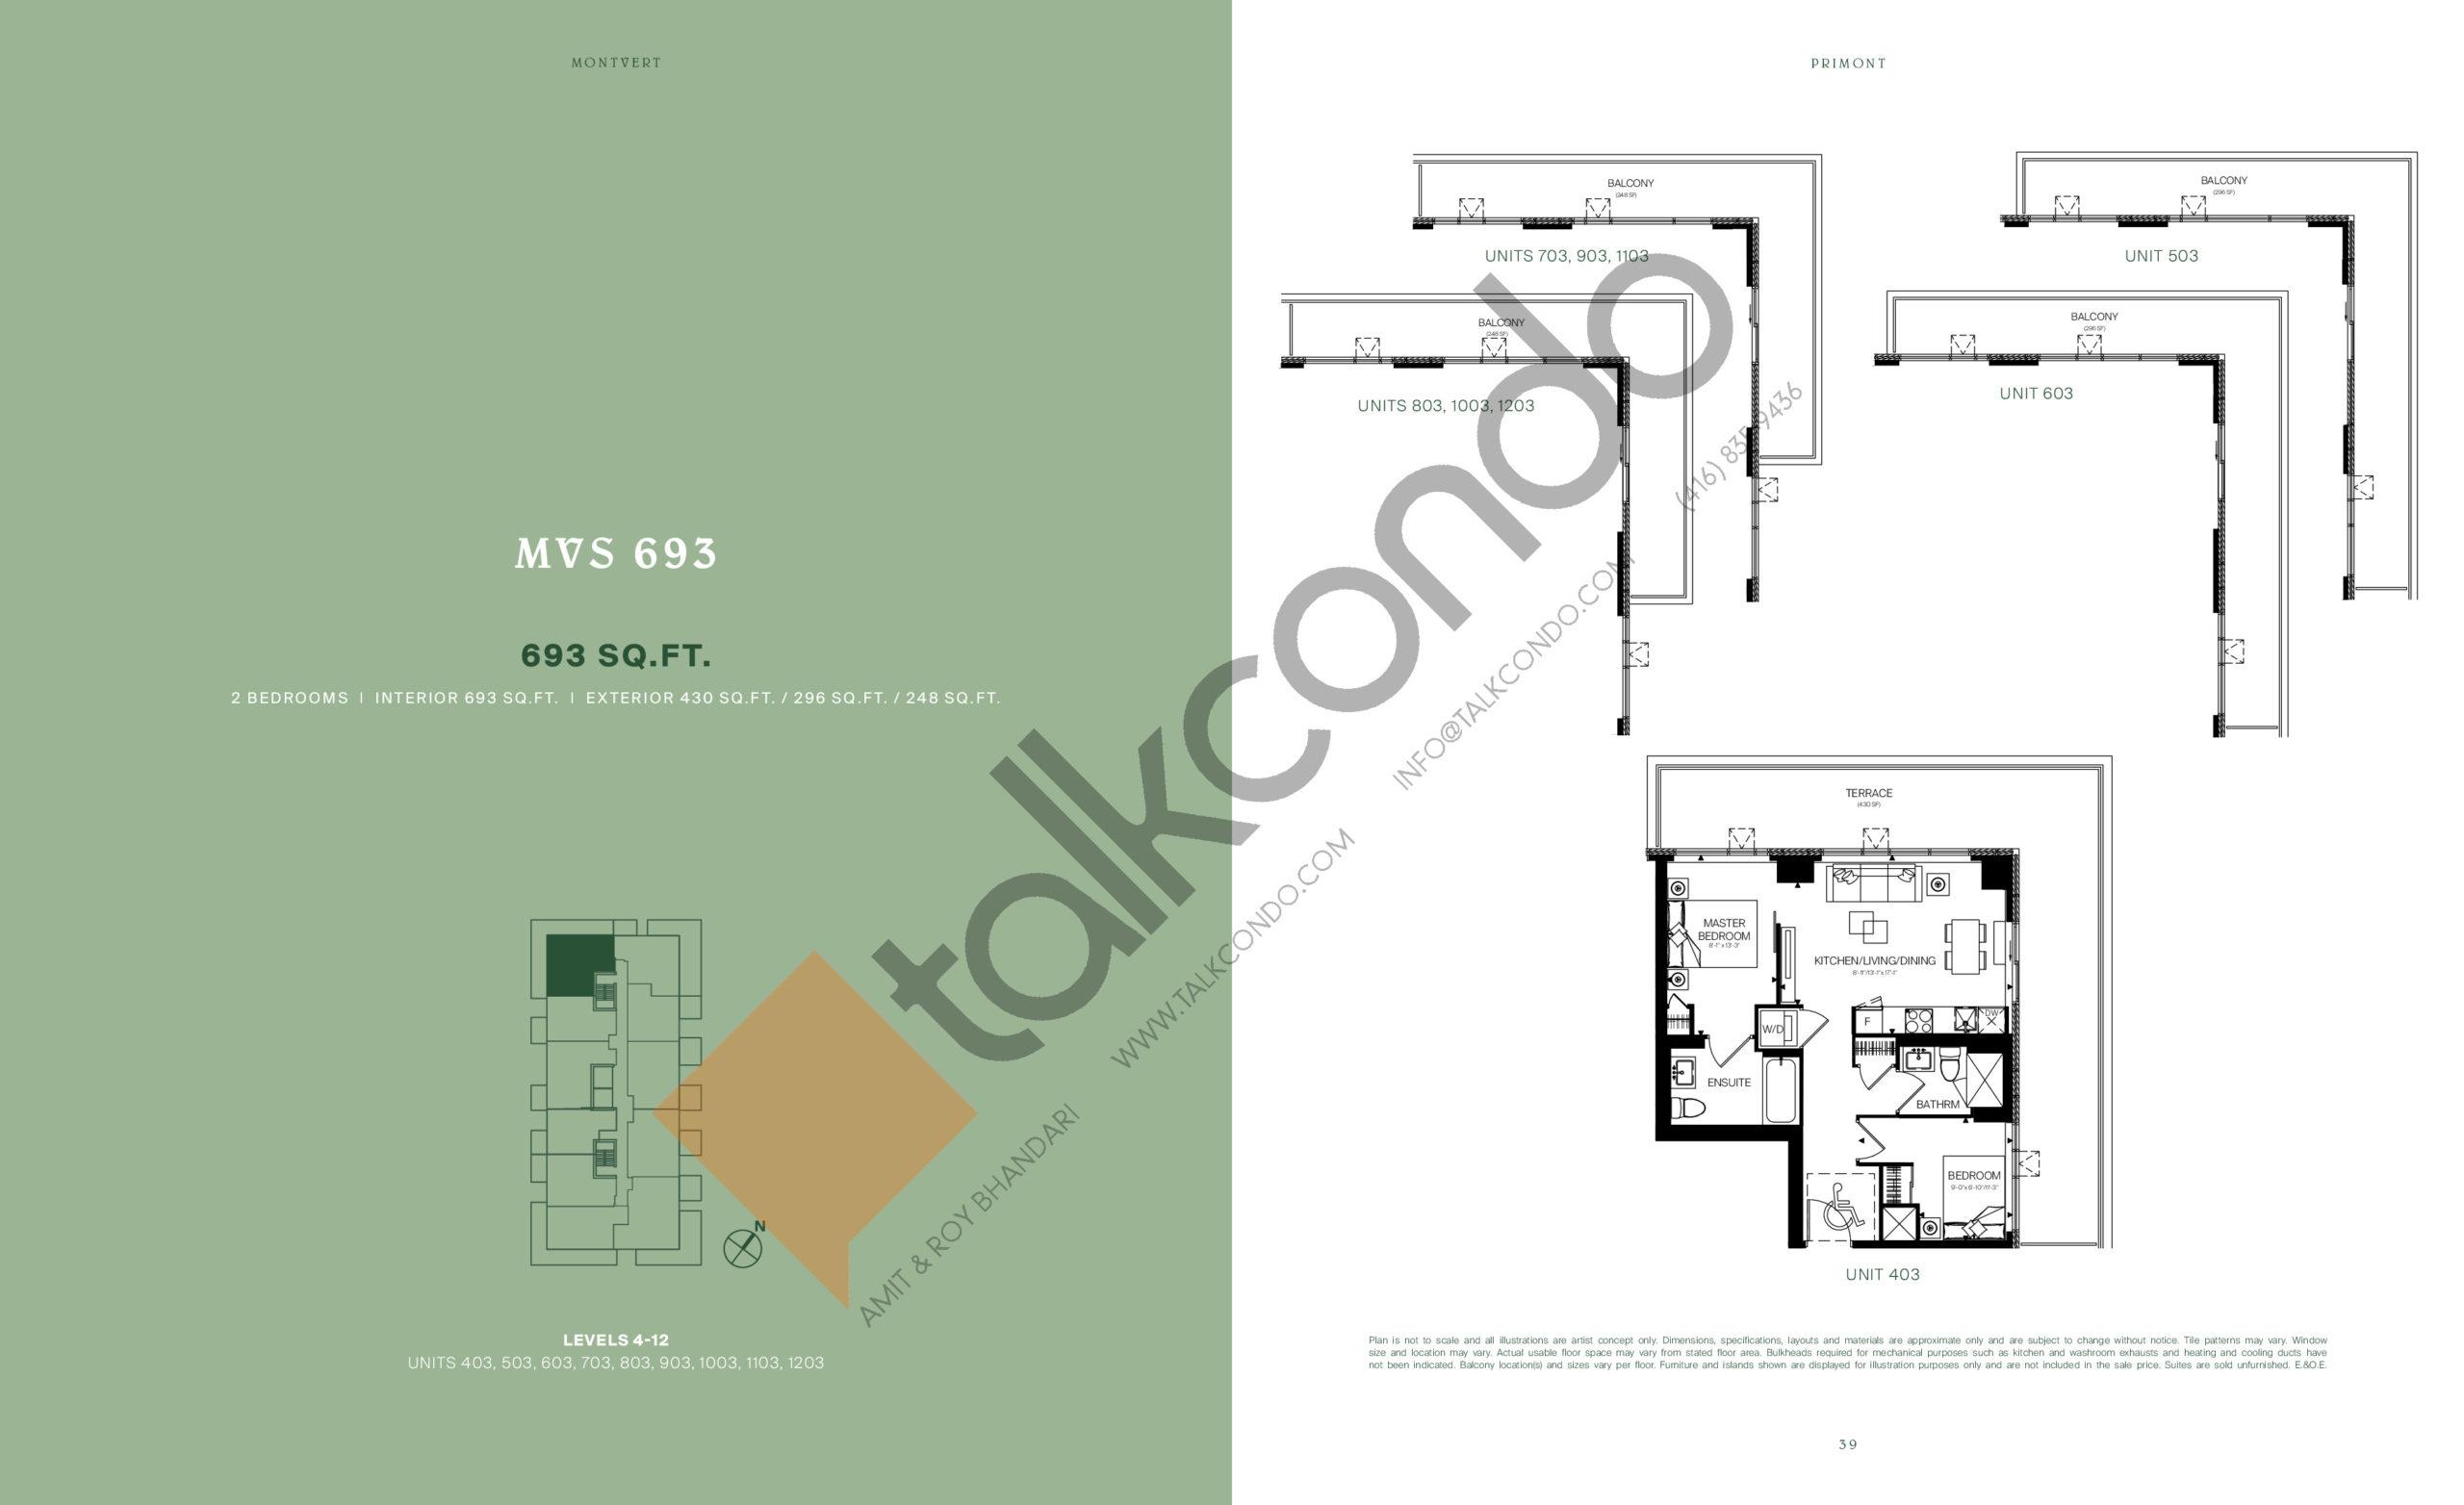 MVS 693 Floor Plan at MontVert Condos - 693 sq.ft